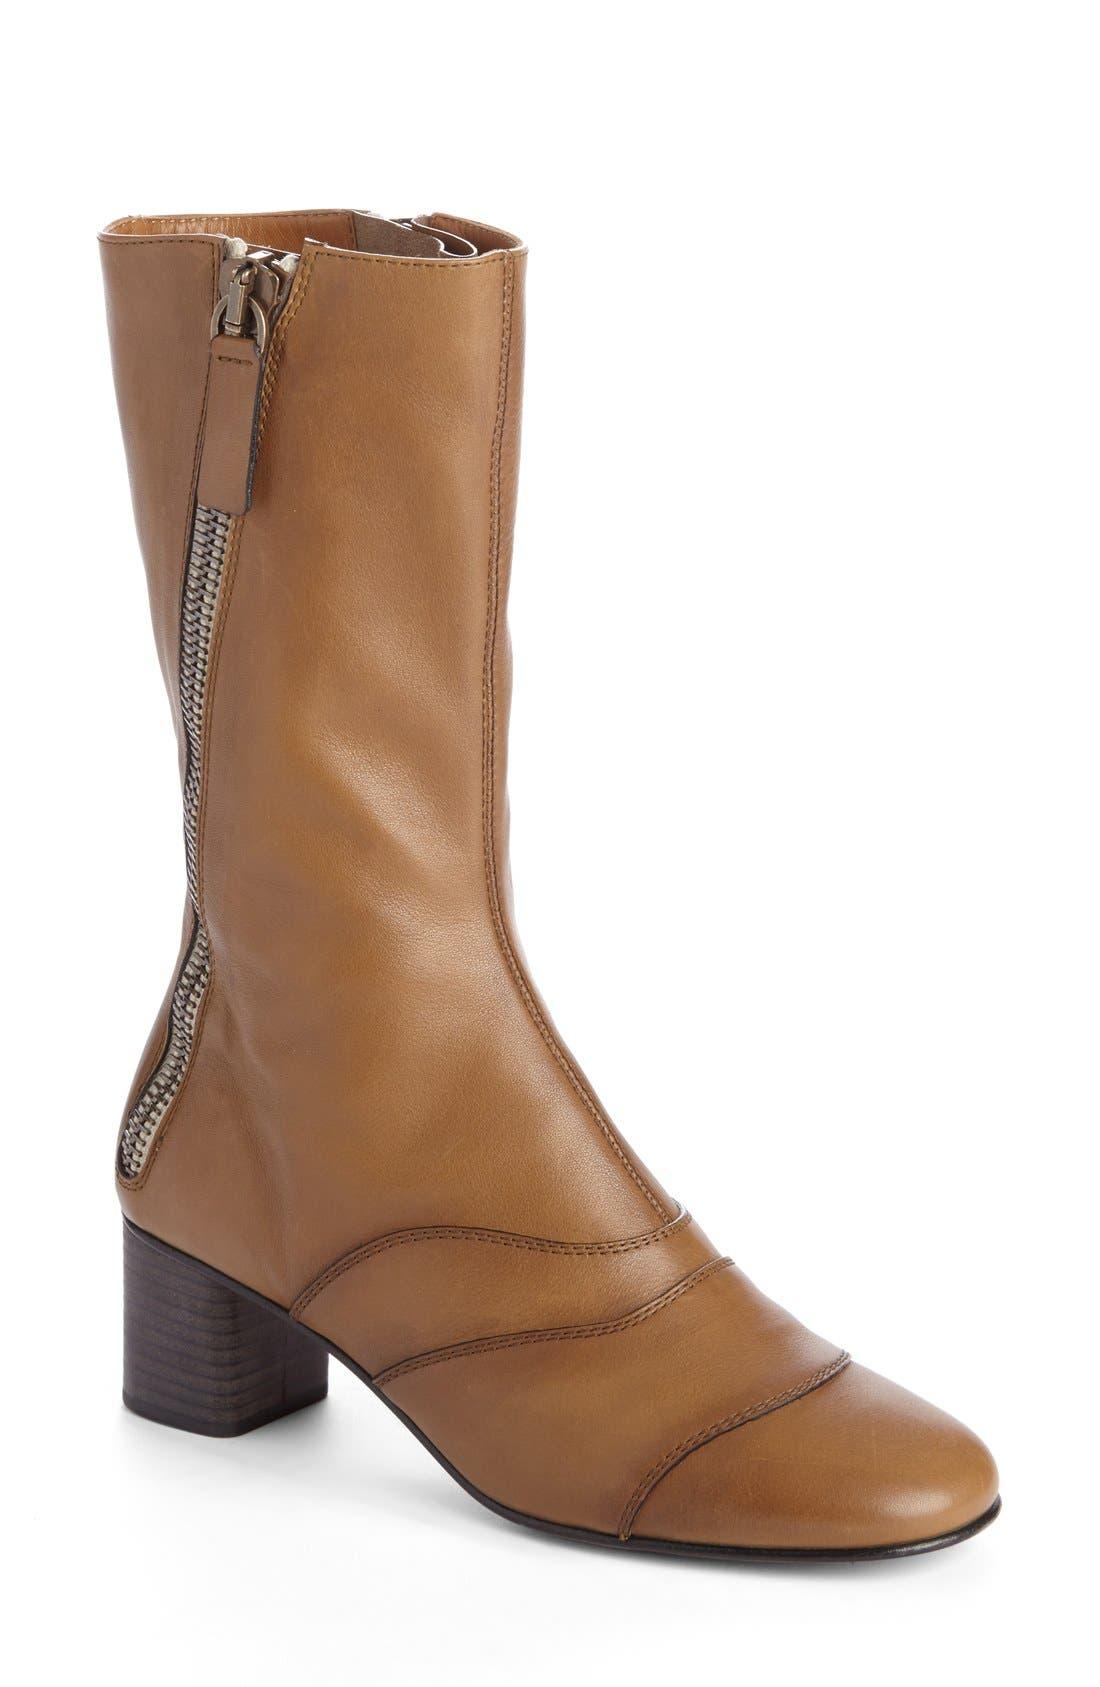 Main Image - Chloé 'Lexie' Block Heel Boot (Women)